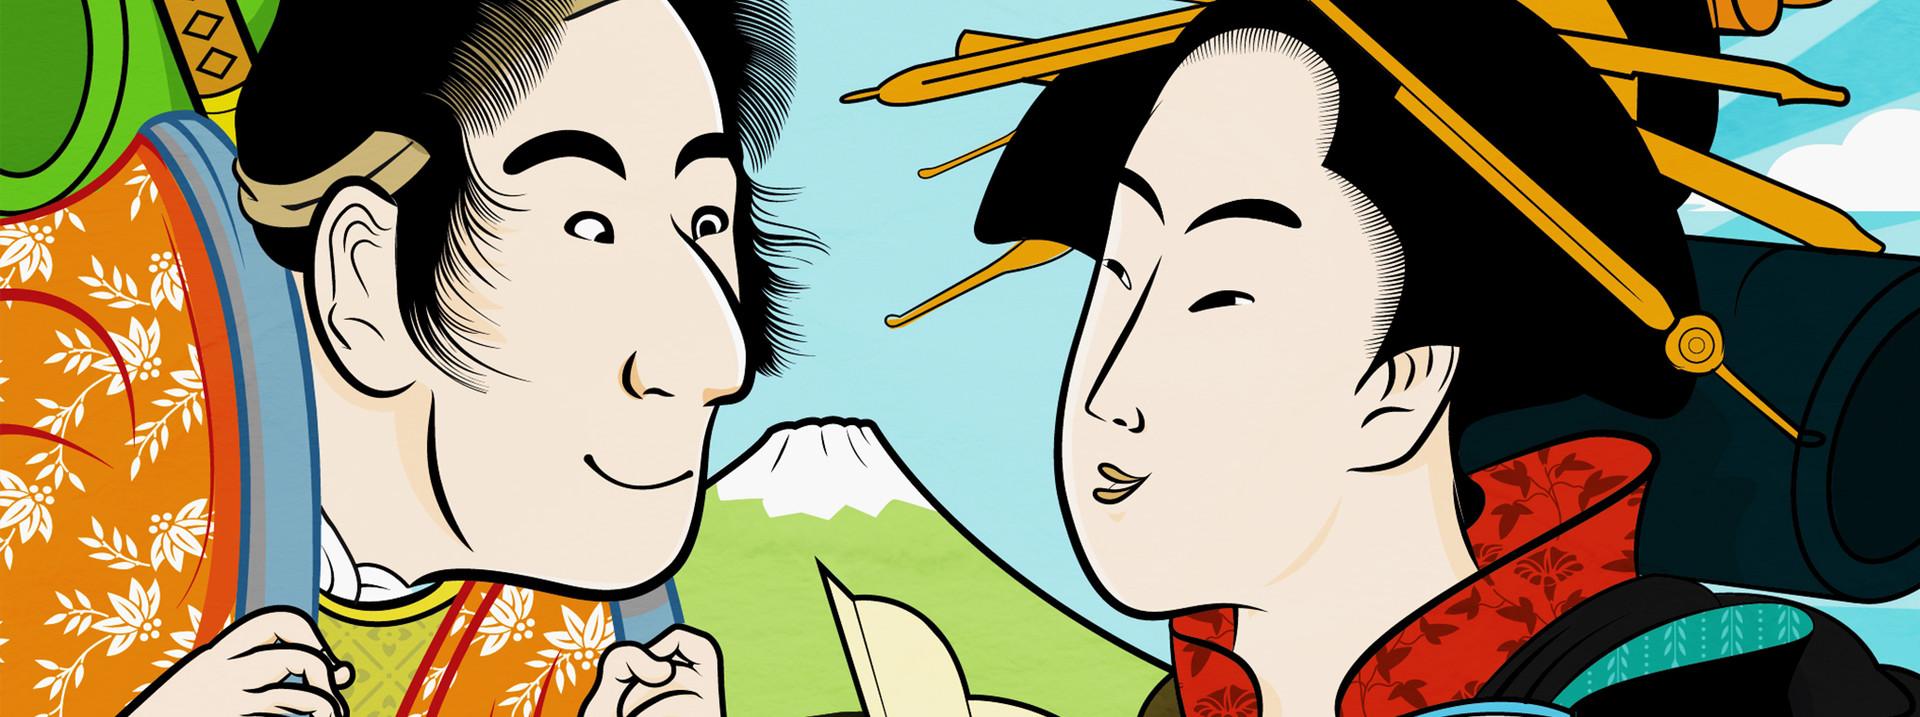 Marco baccioli fukuoka illustration v2 facebook page